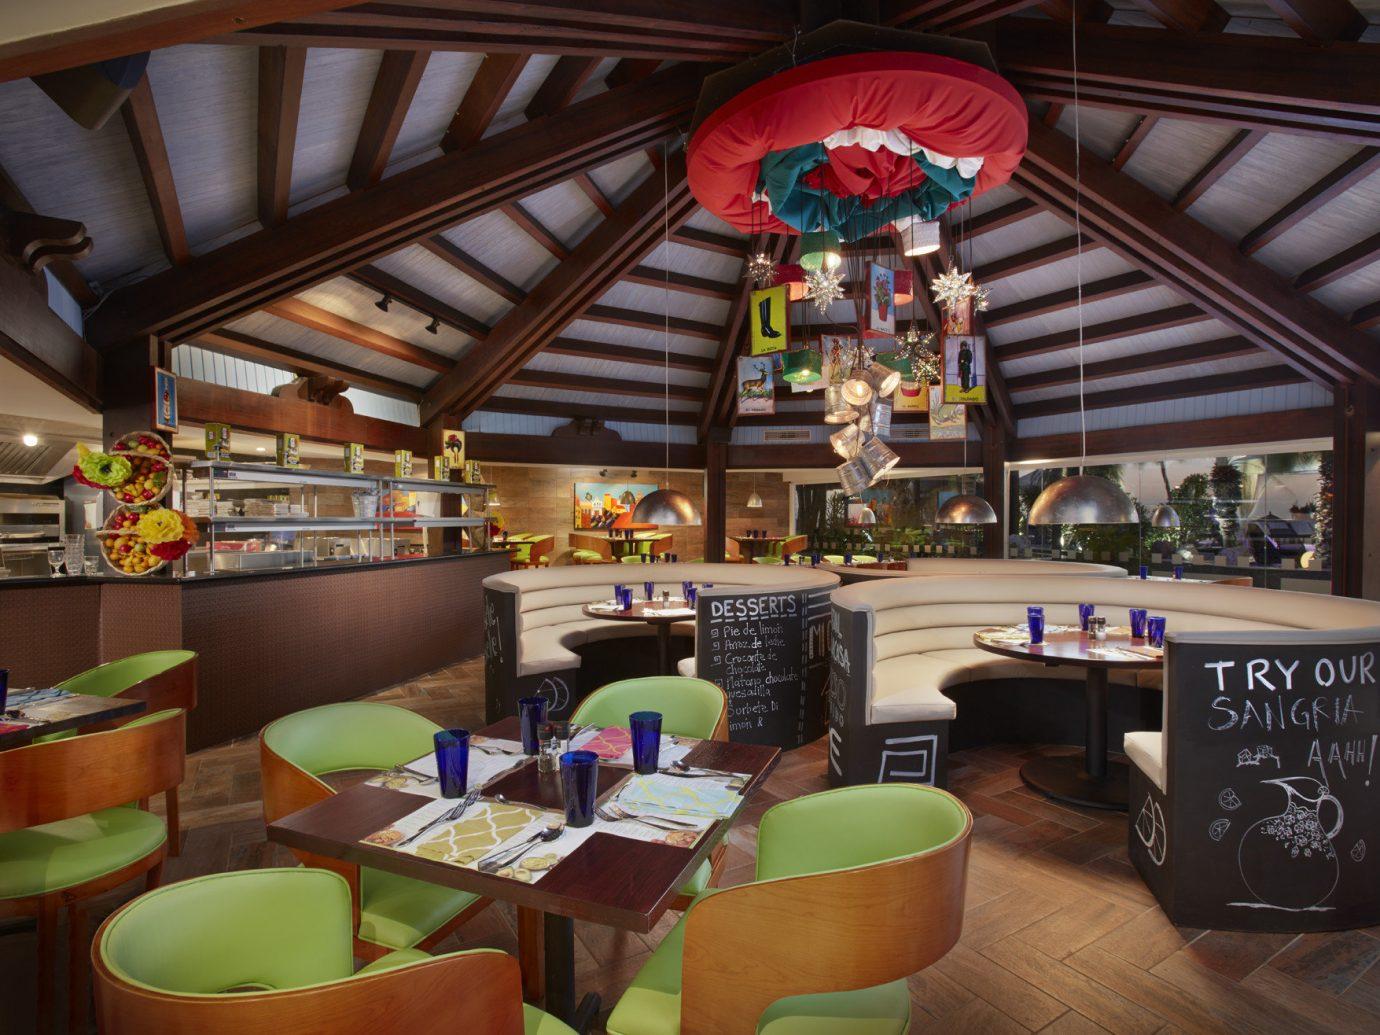 Hotels Romance indoor ceiling interior design restaurant meal